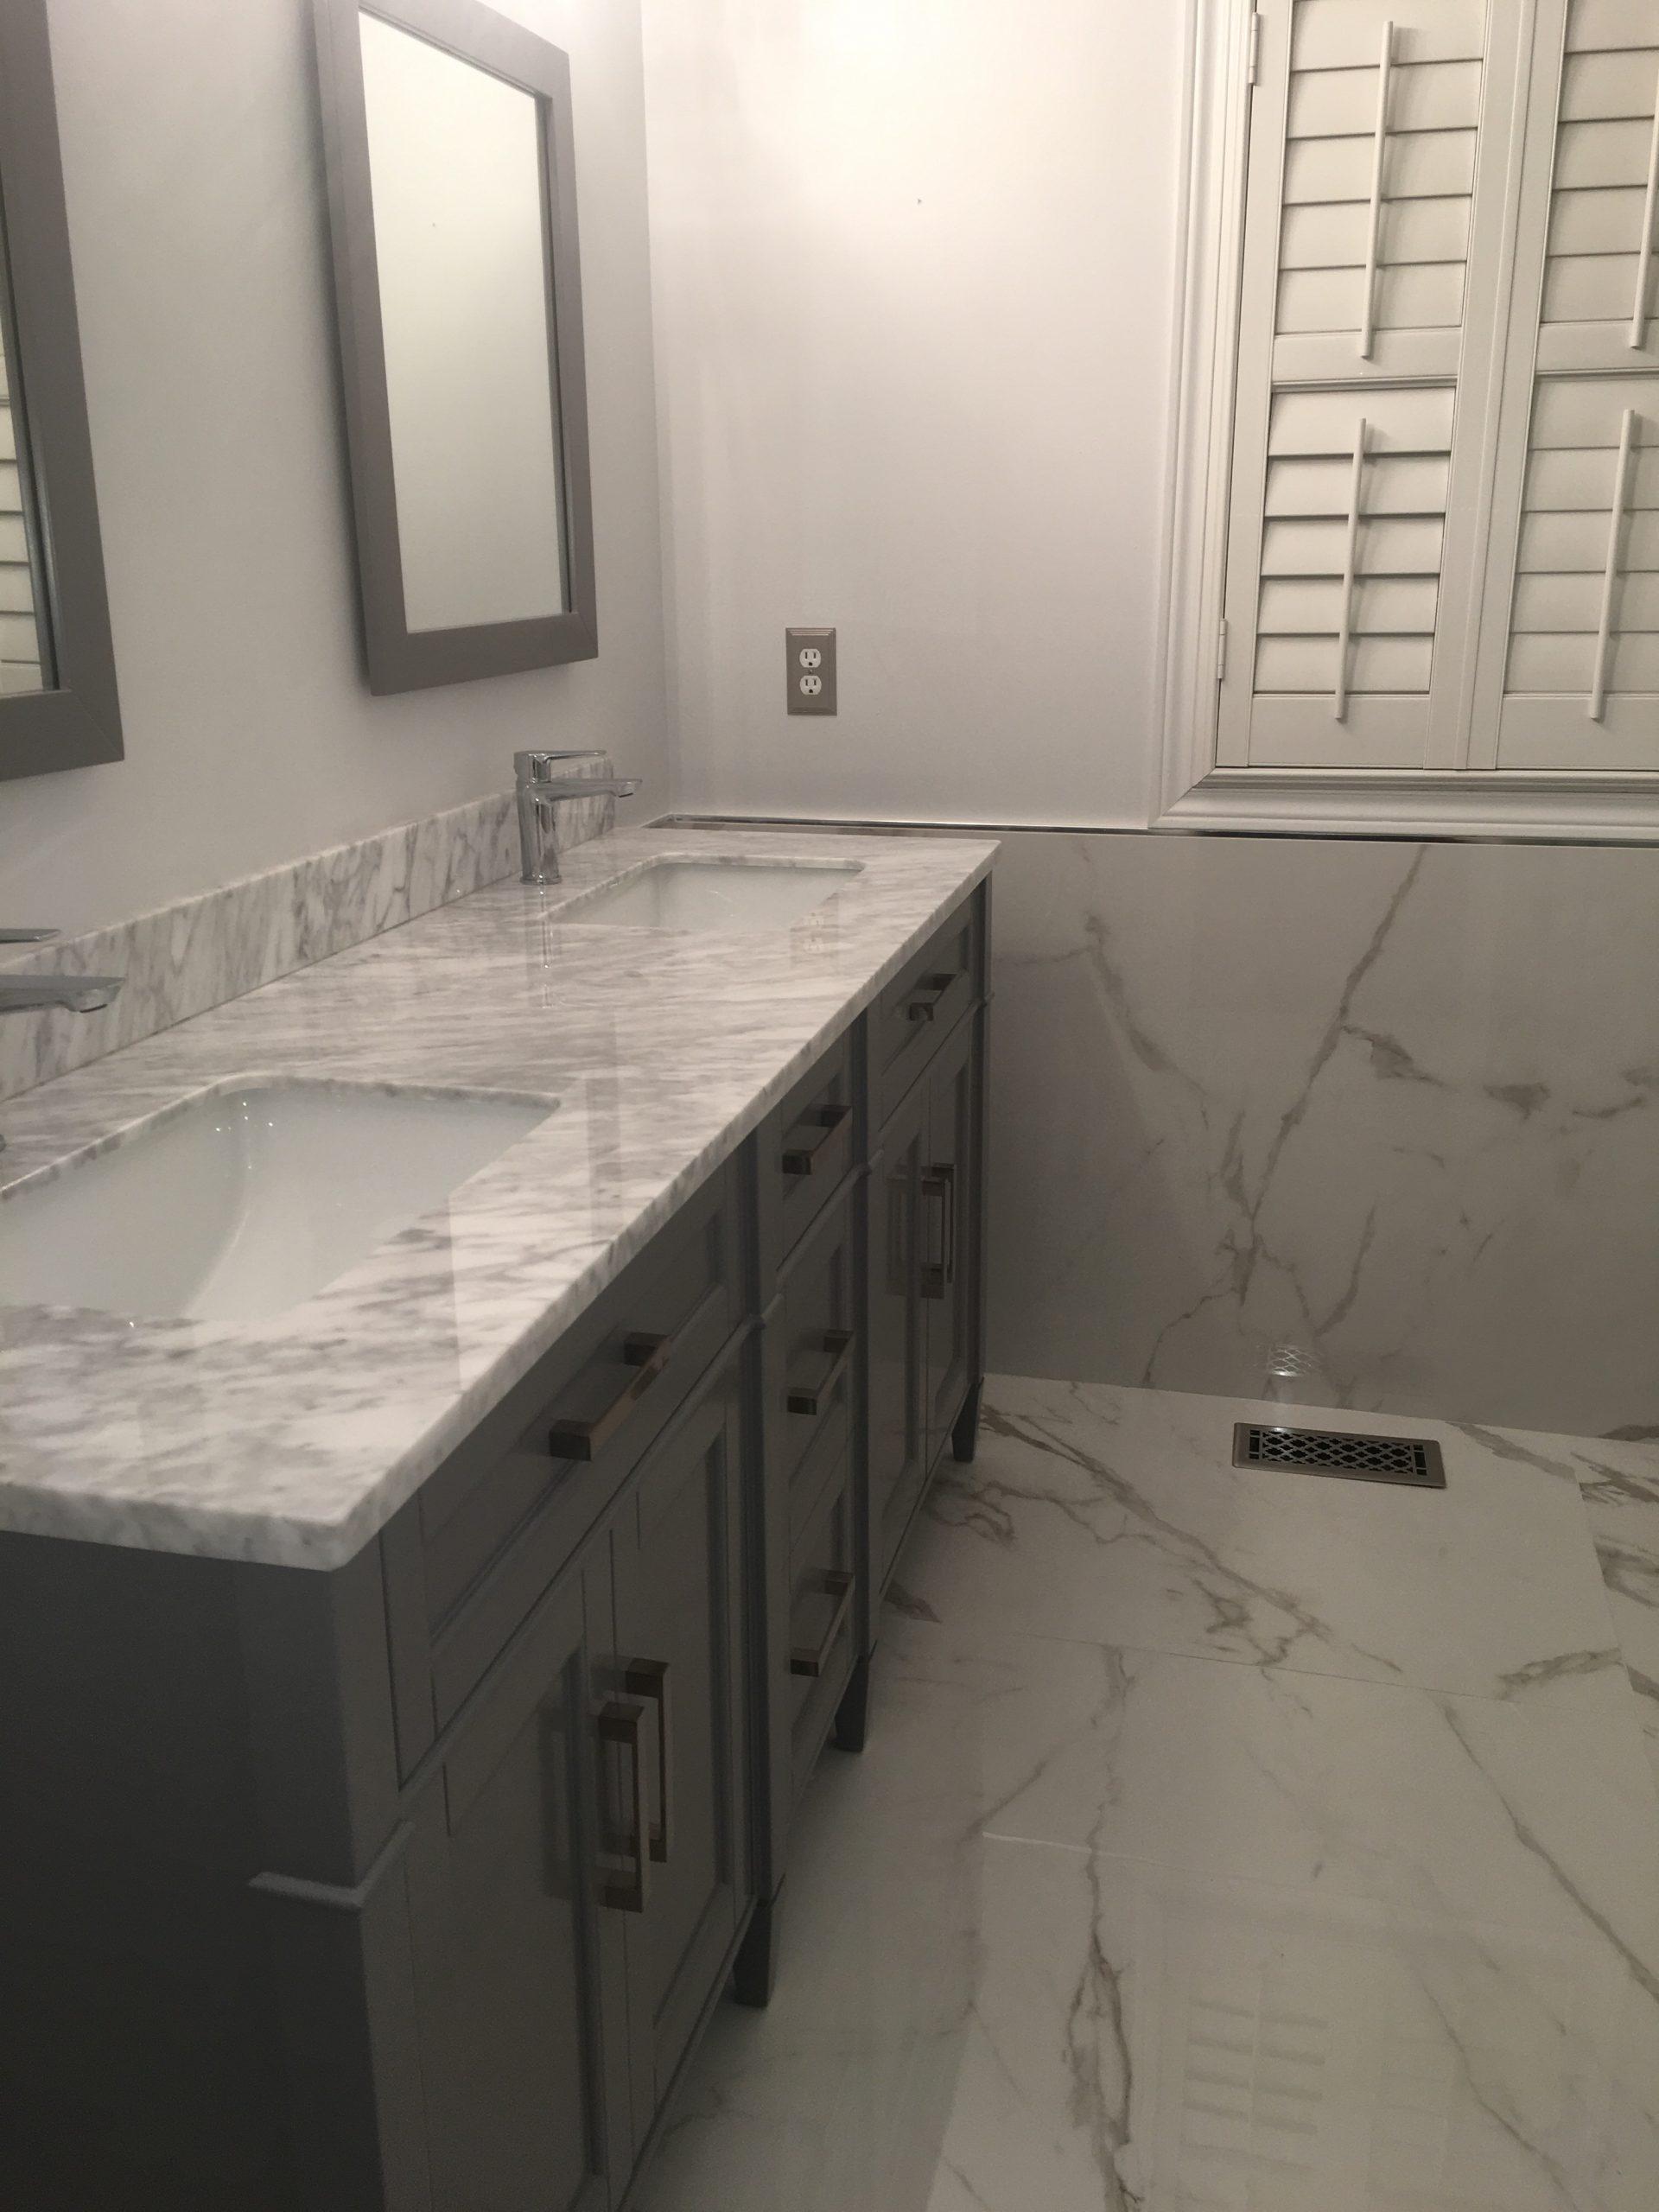 porcelain floor kitchen islands home depot bathroom project: bianco carrara & xl statuario | marble ...